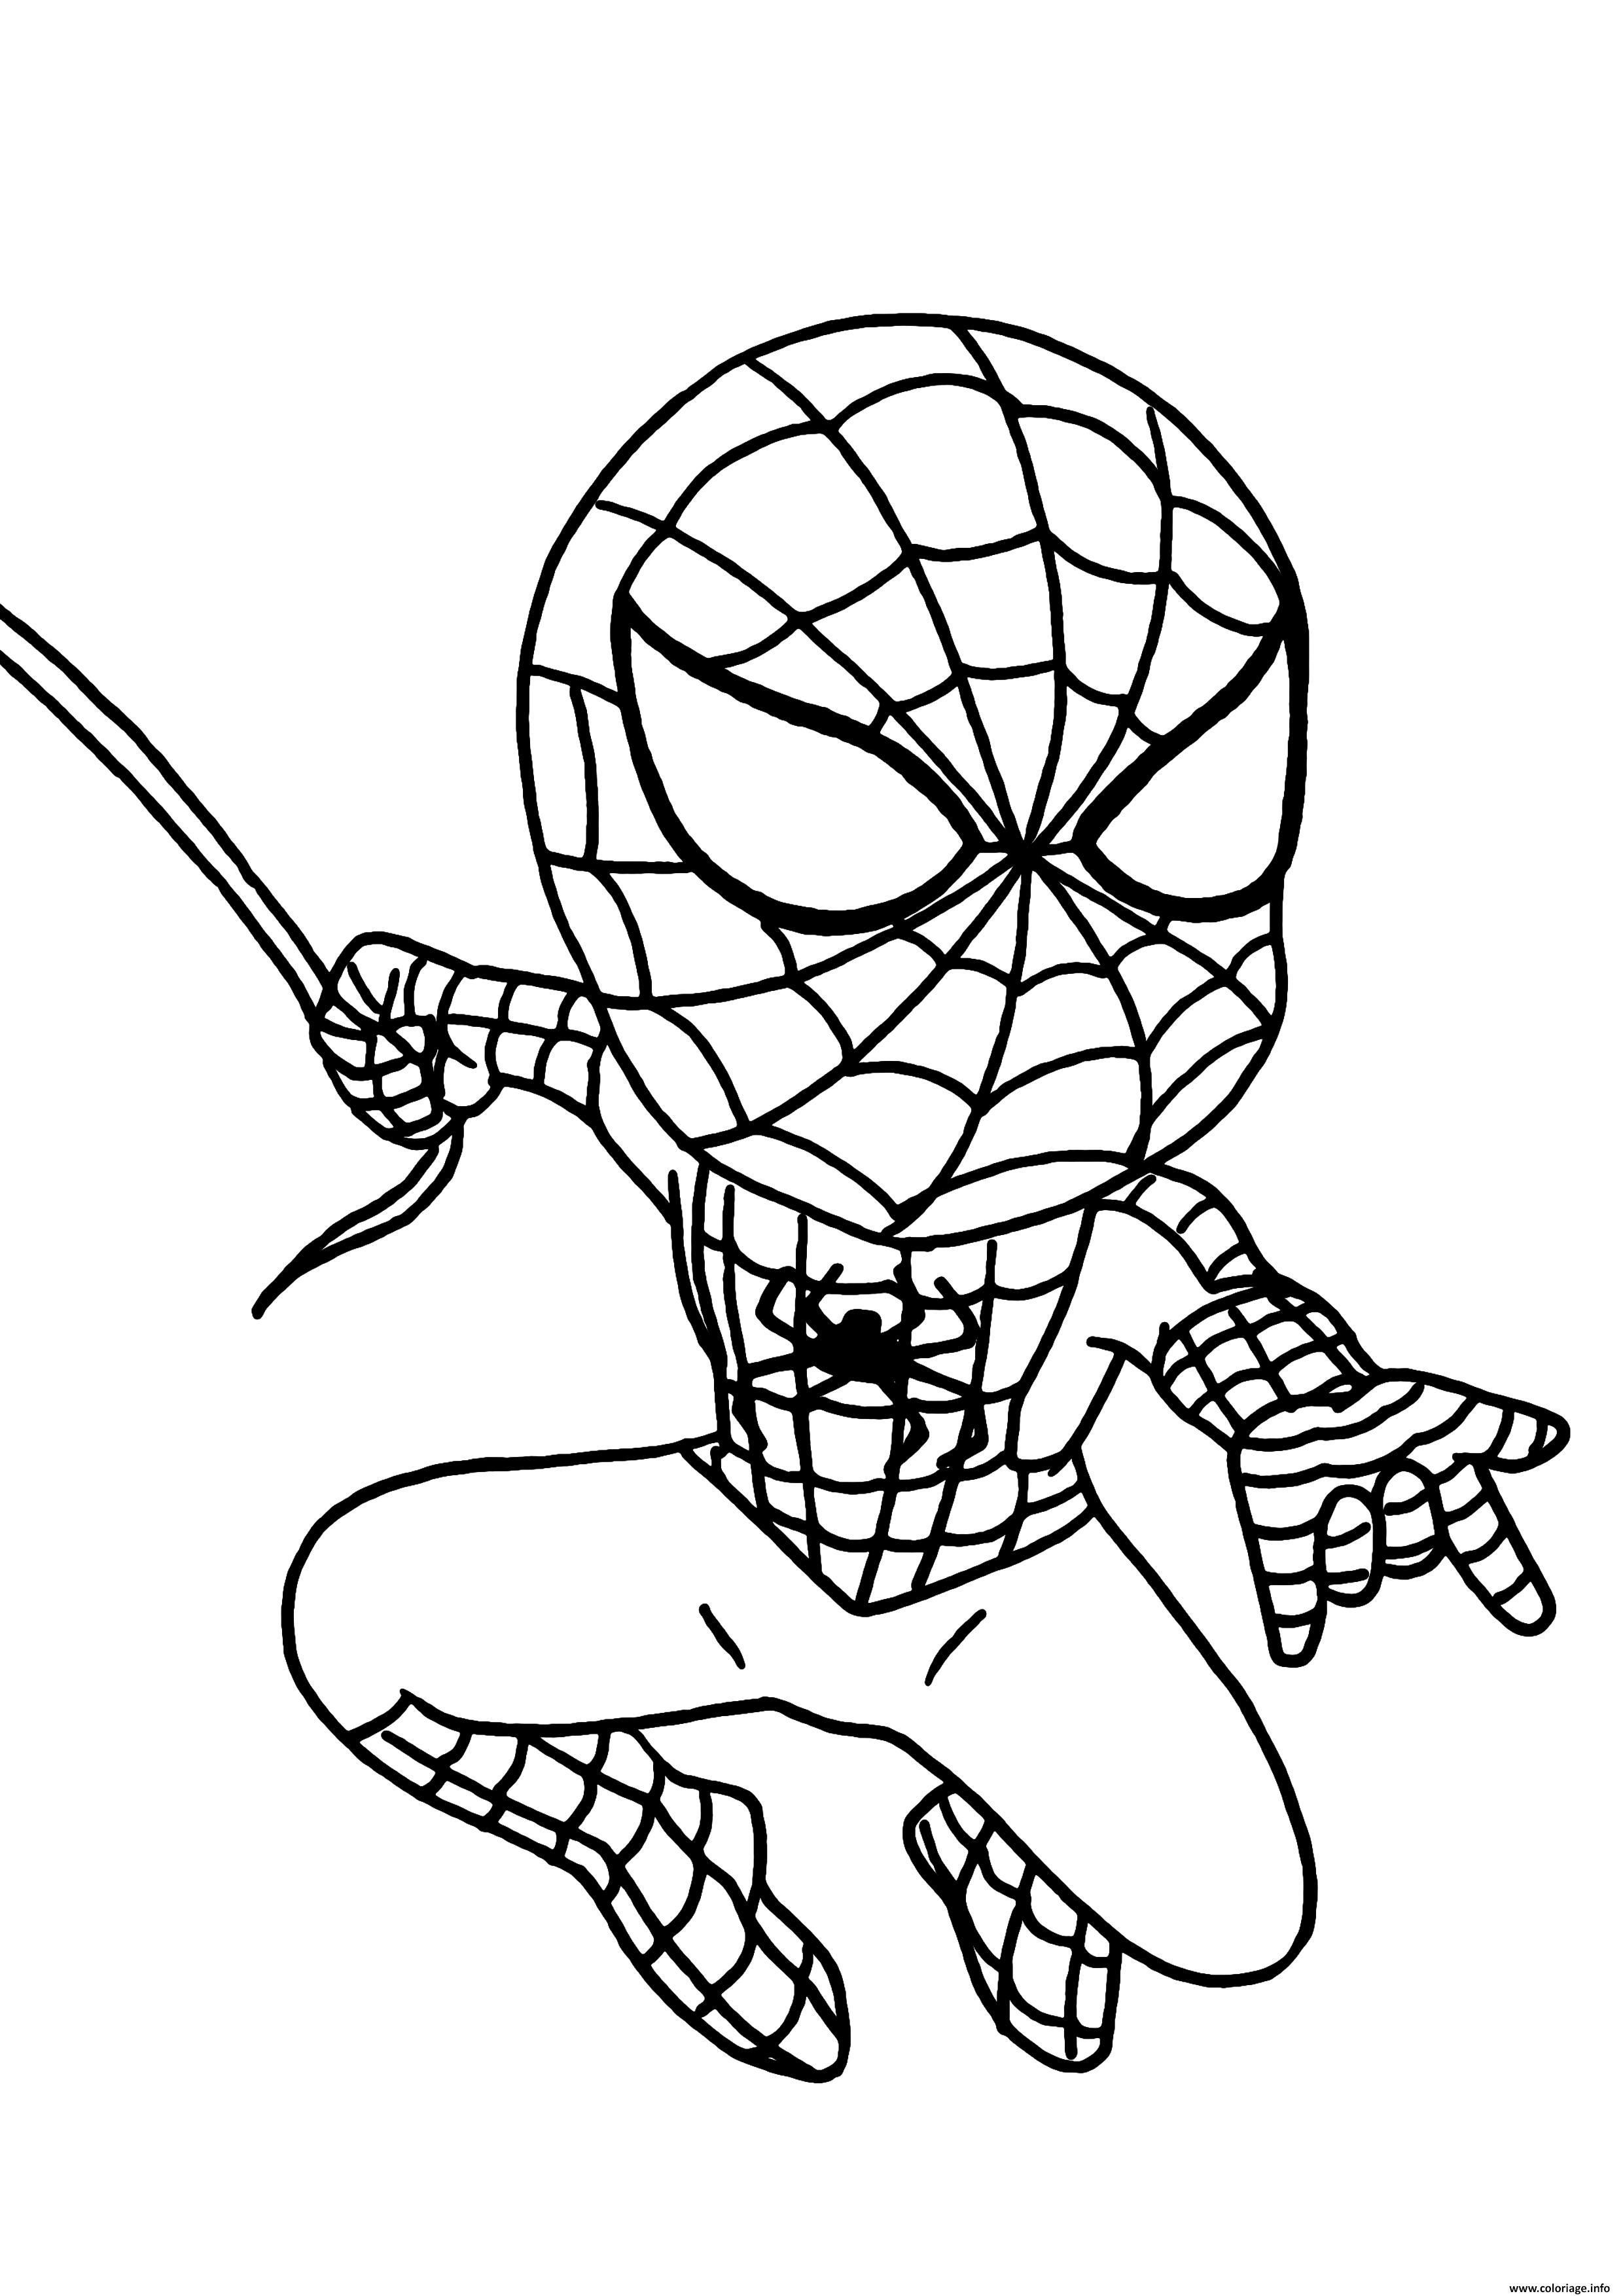 Dessin garcon super heros spiderman Coloriage Gratuit à Imprimer